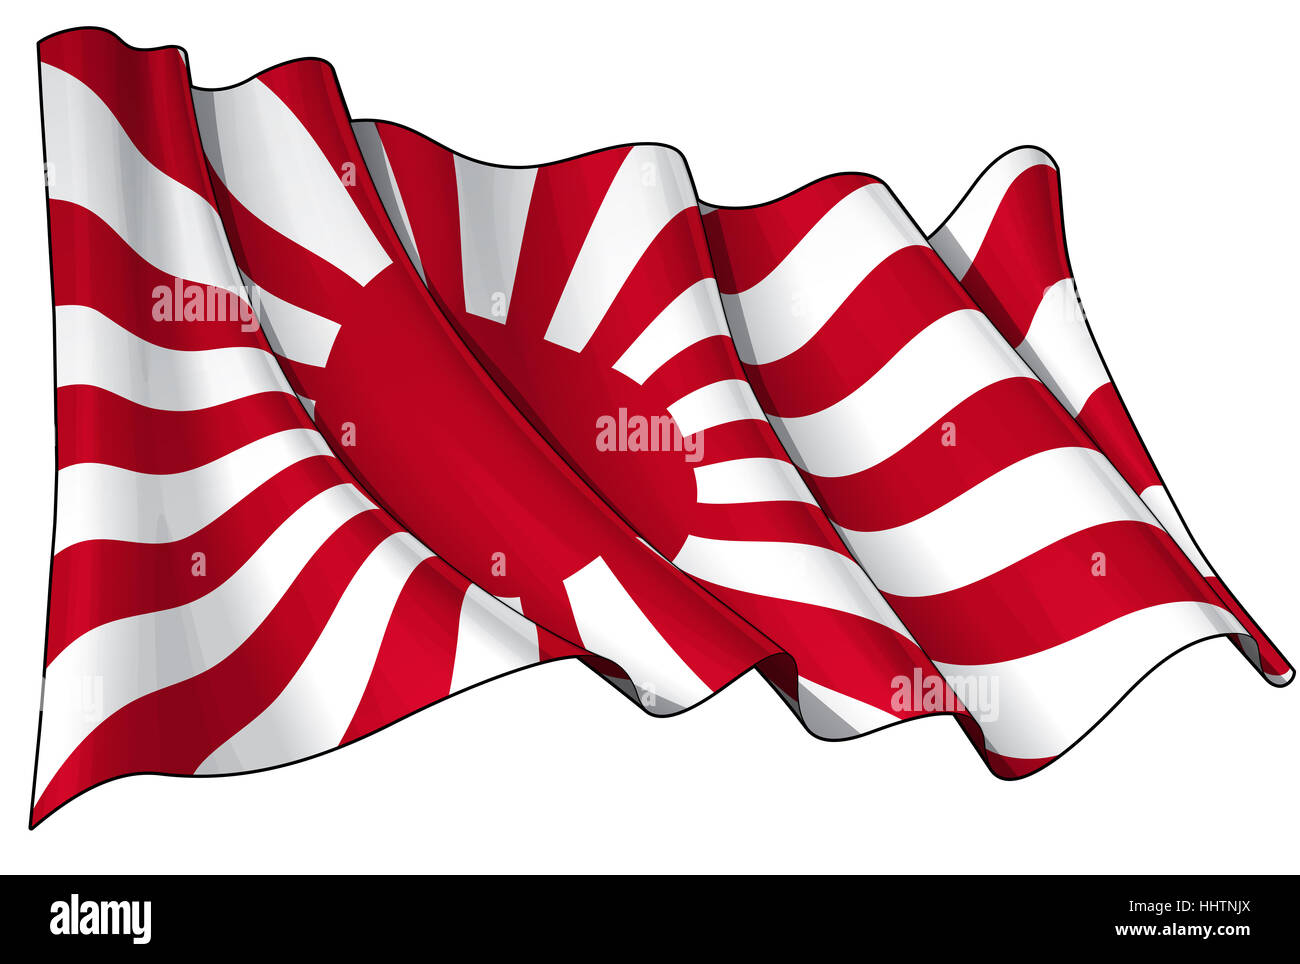 Navy flag pacific salt water sea ocean water for Vater japones